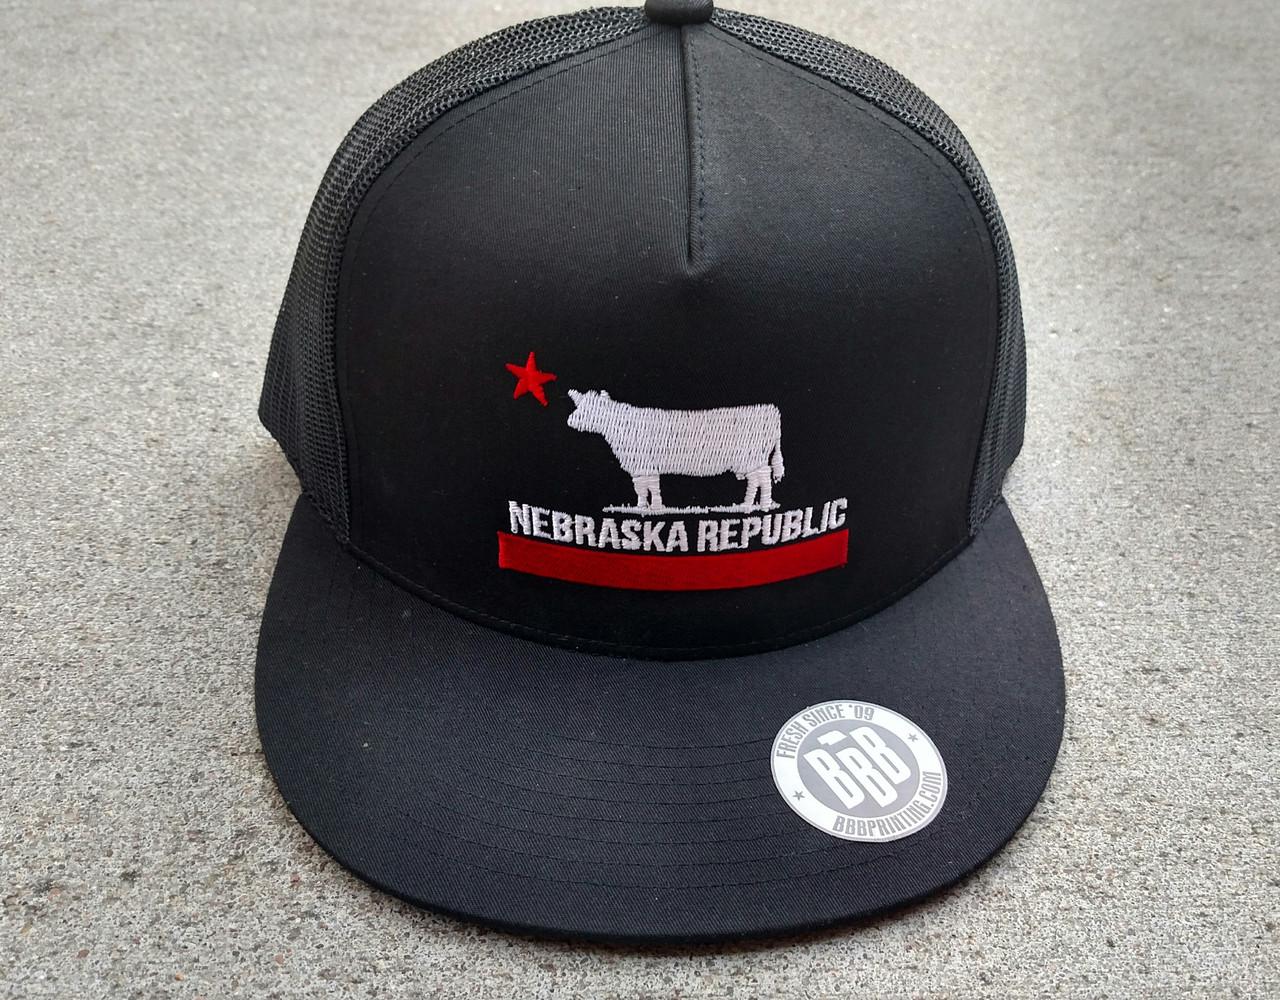 bc4bd9e11ef Nebraska Republic flatbill full black red white - bbbprinting.com